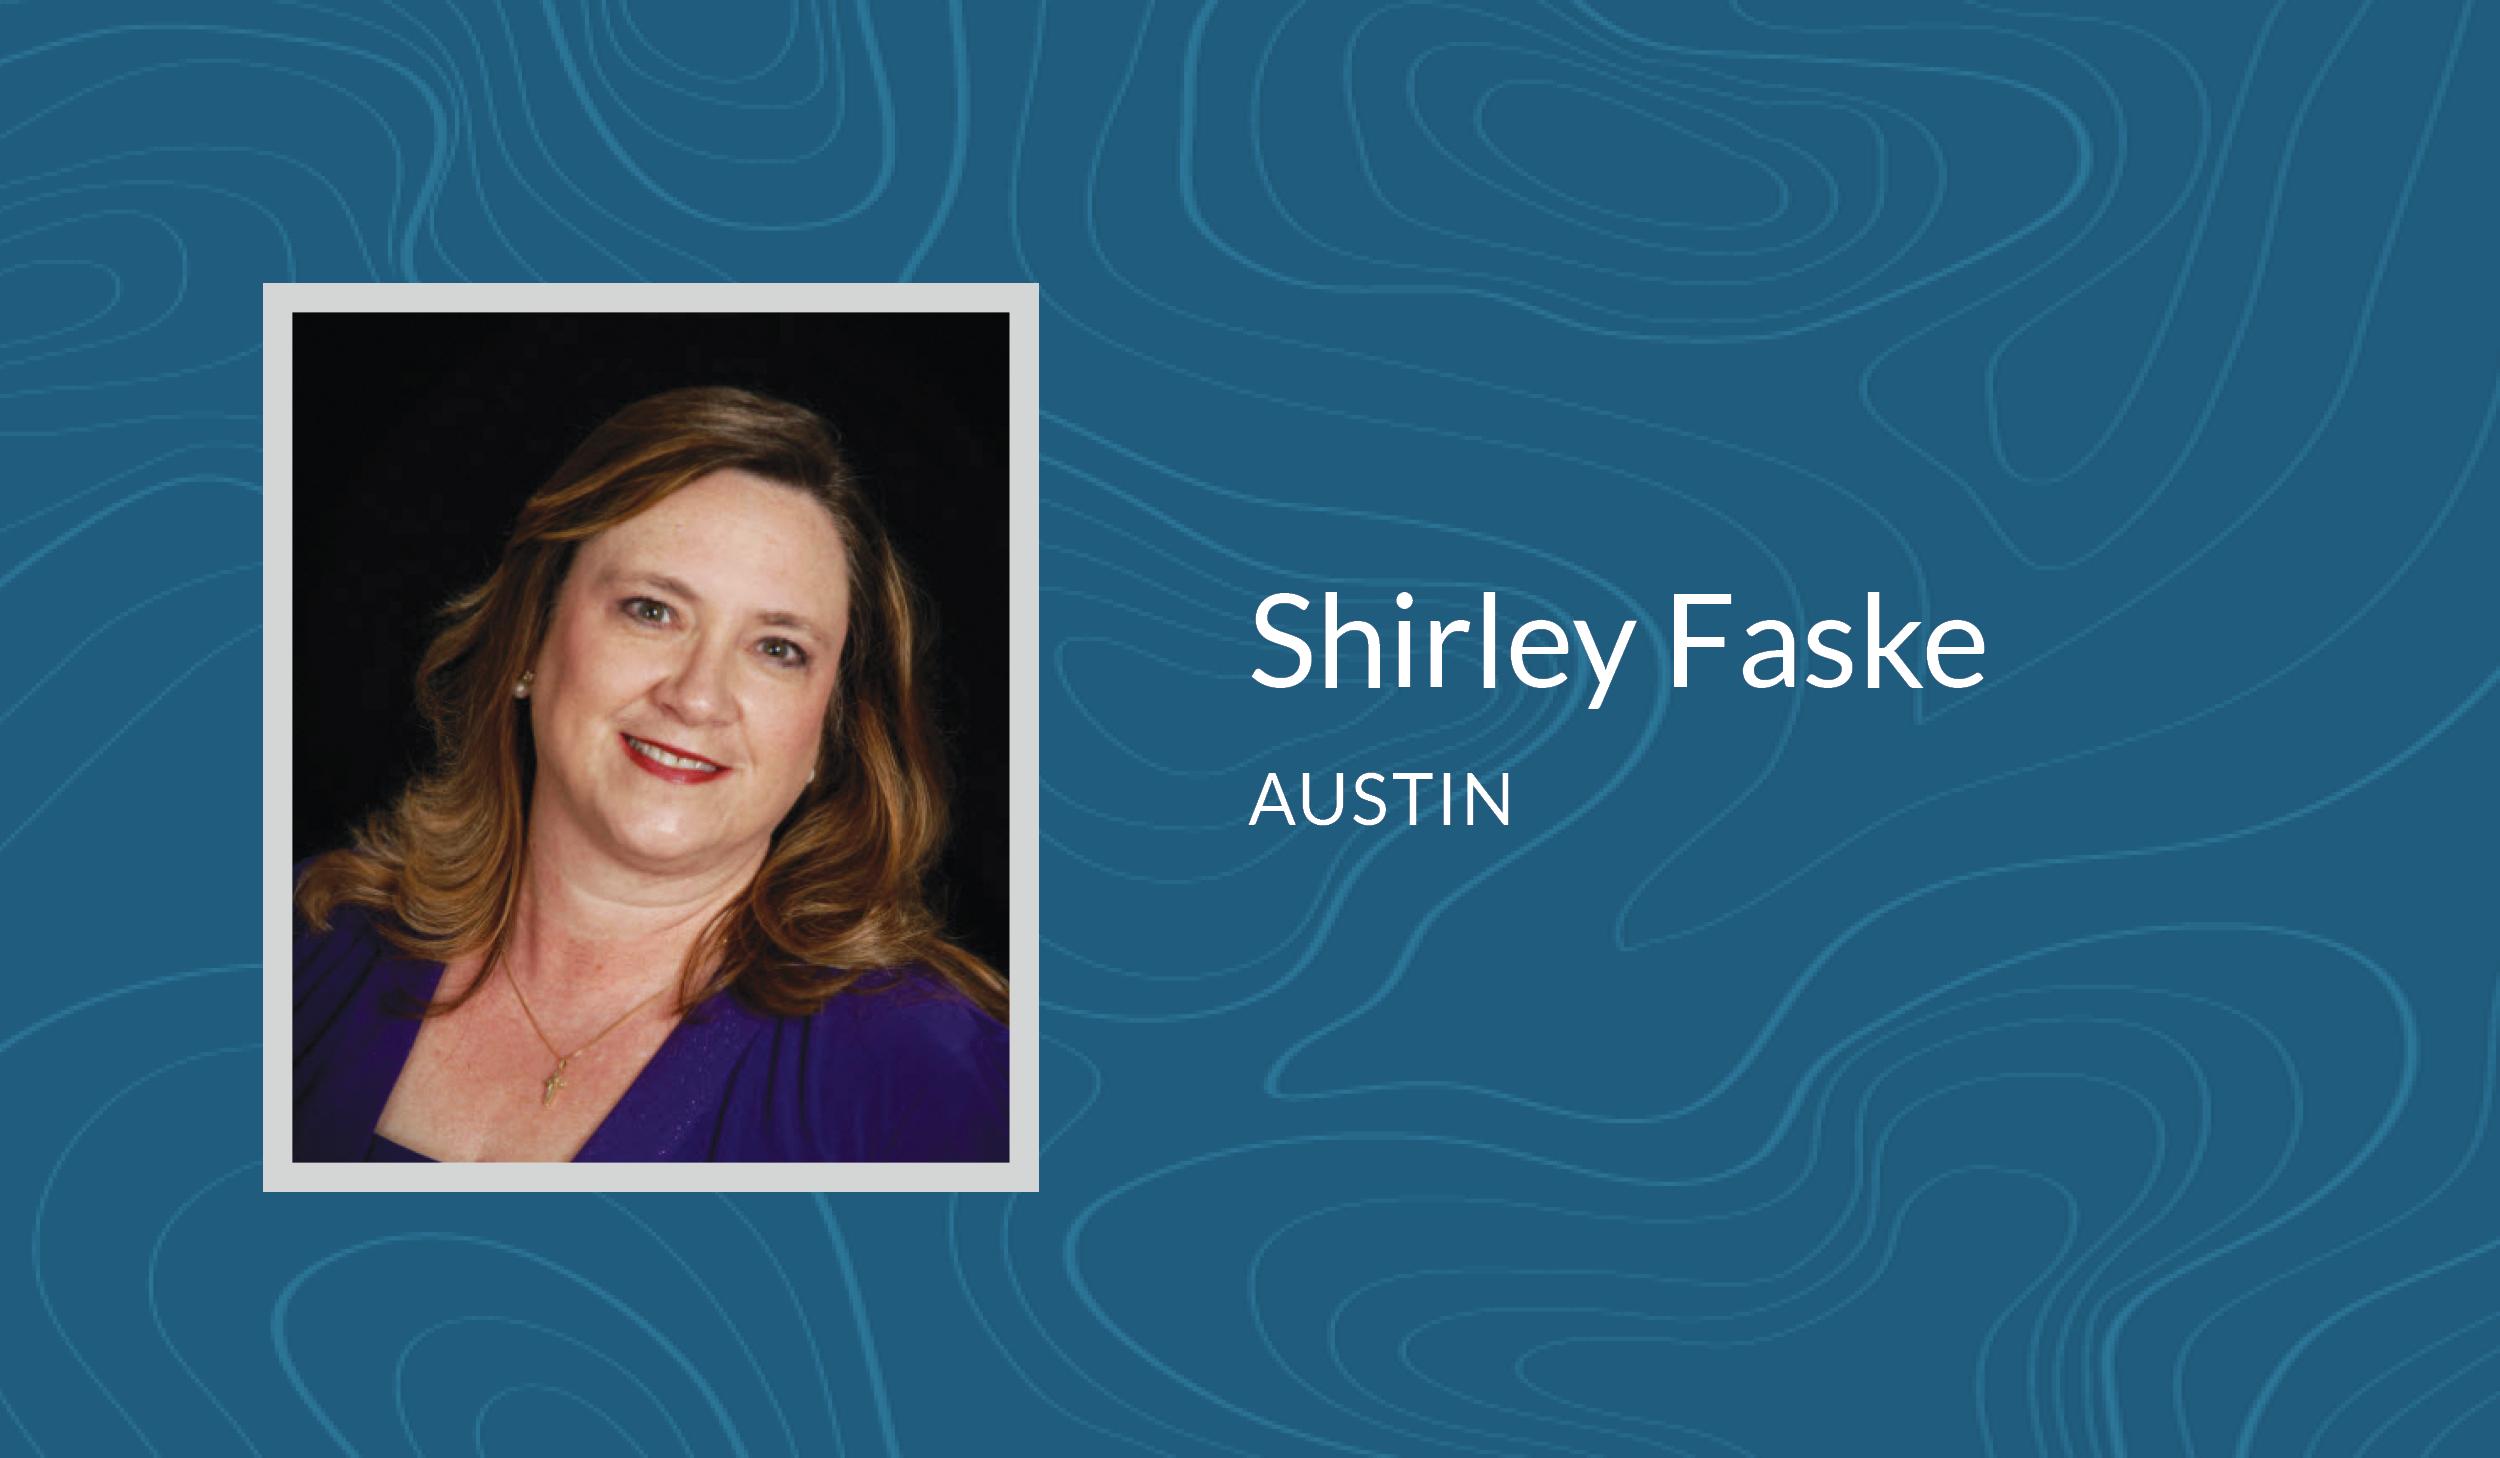 Shirley Faske Landing Page Headers.png